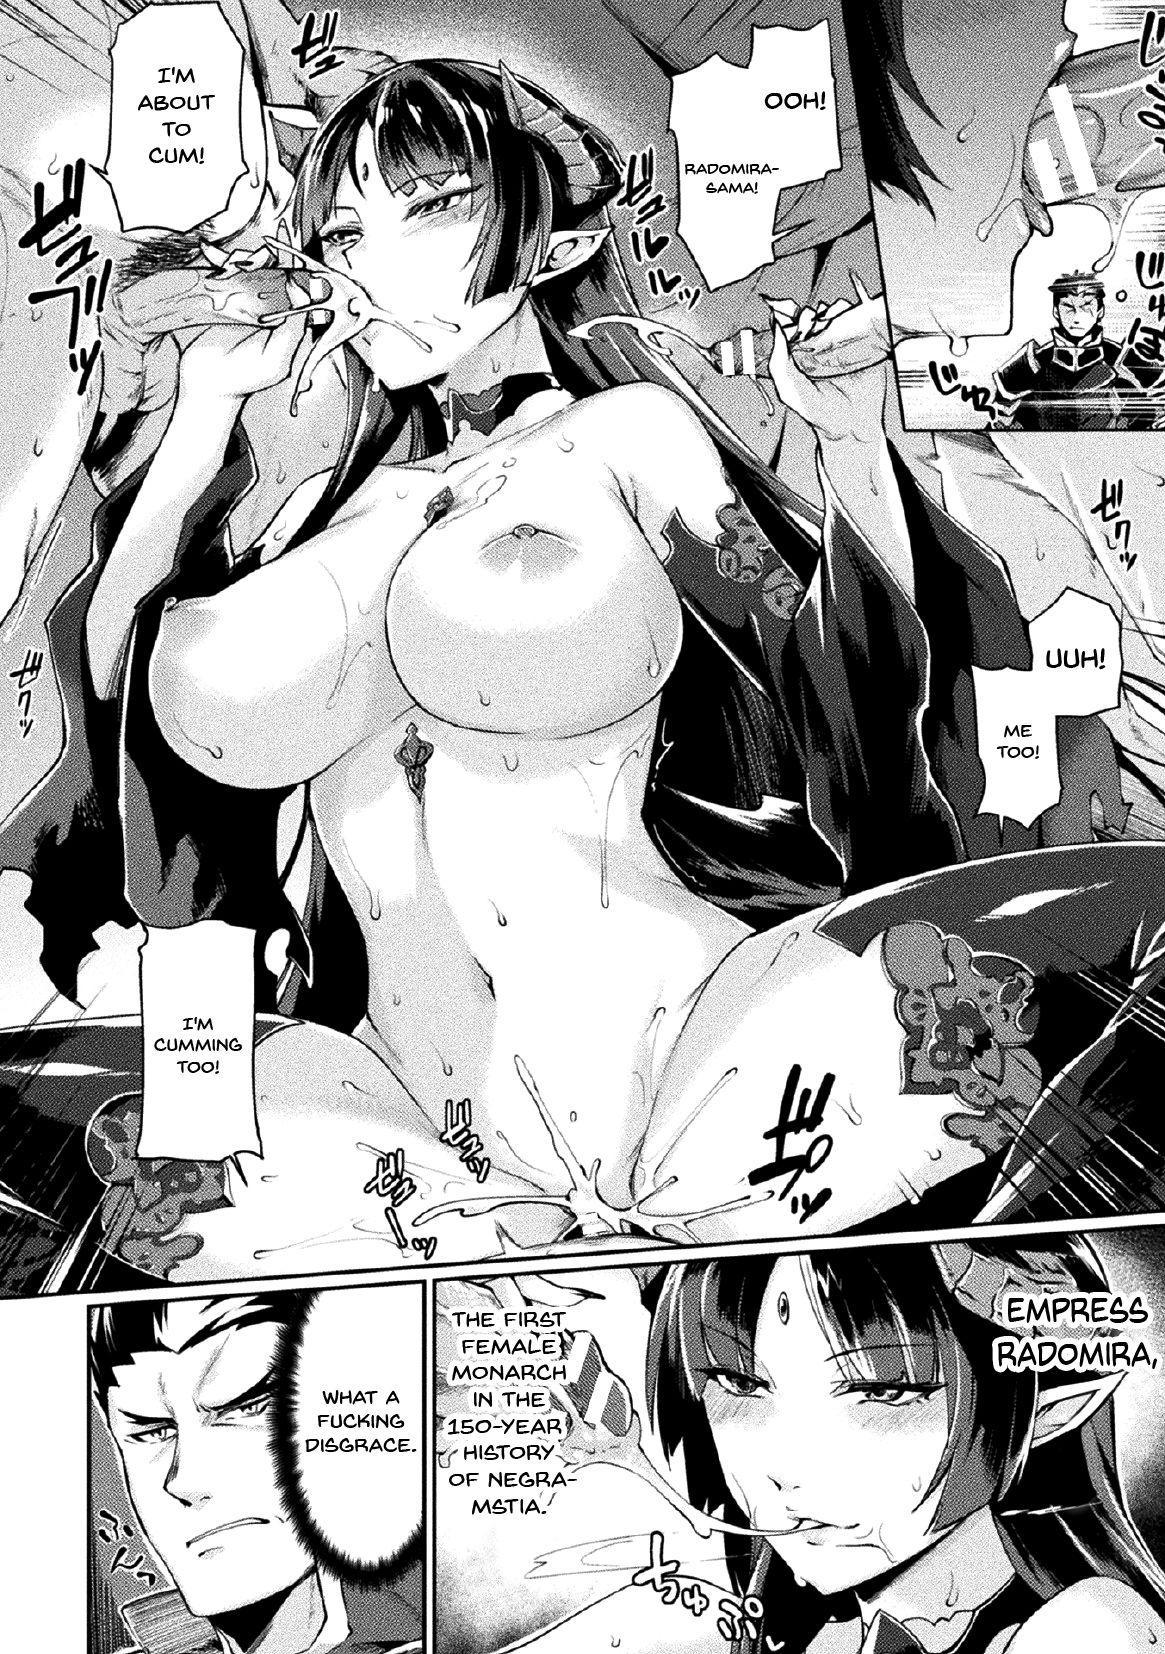 [Tsukitokage] Kuroinu II ~Inyoku ni Somaru Haitoku no Miyako, Futatabi~ THE COMIC | Kuroinu II ~Corrupted Town Stained With Lust~ THE COMIC Ch. 1 (Haiboku Otome Ecstasy Vol. 17) [English] {Doujins.com} [Digital] 5